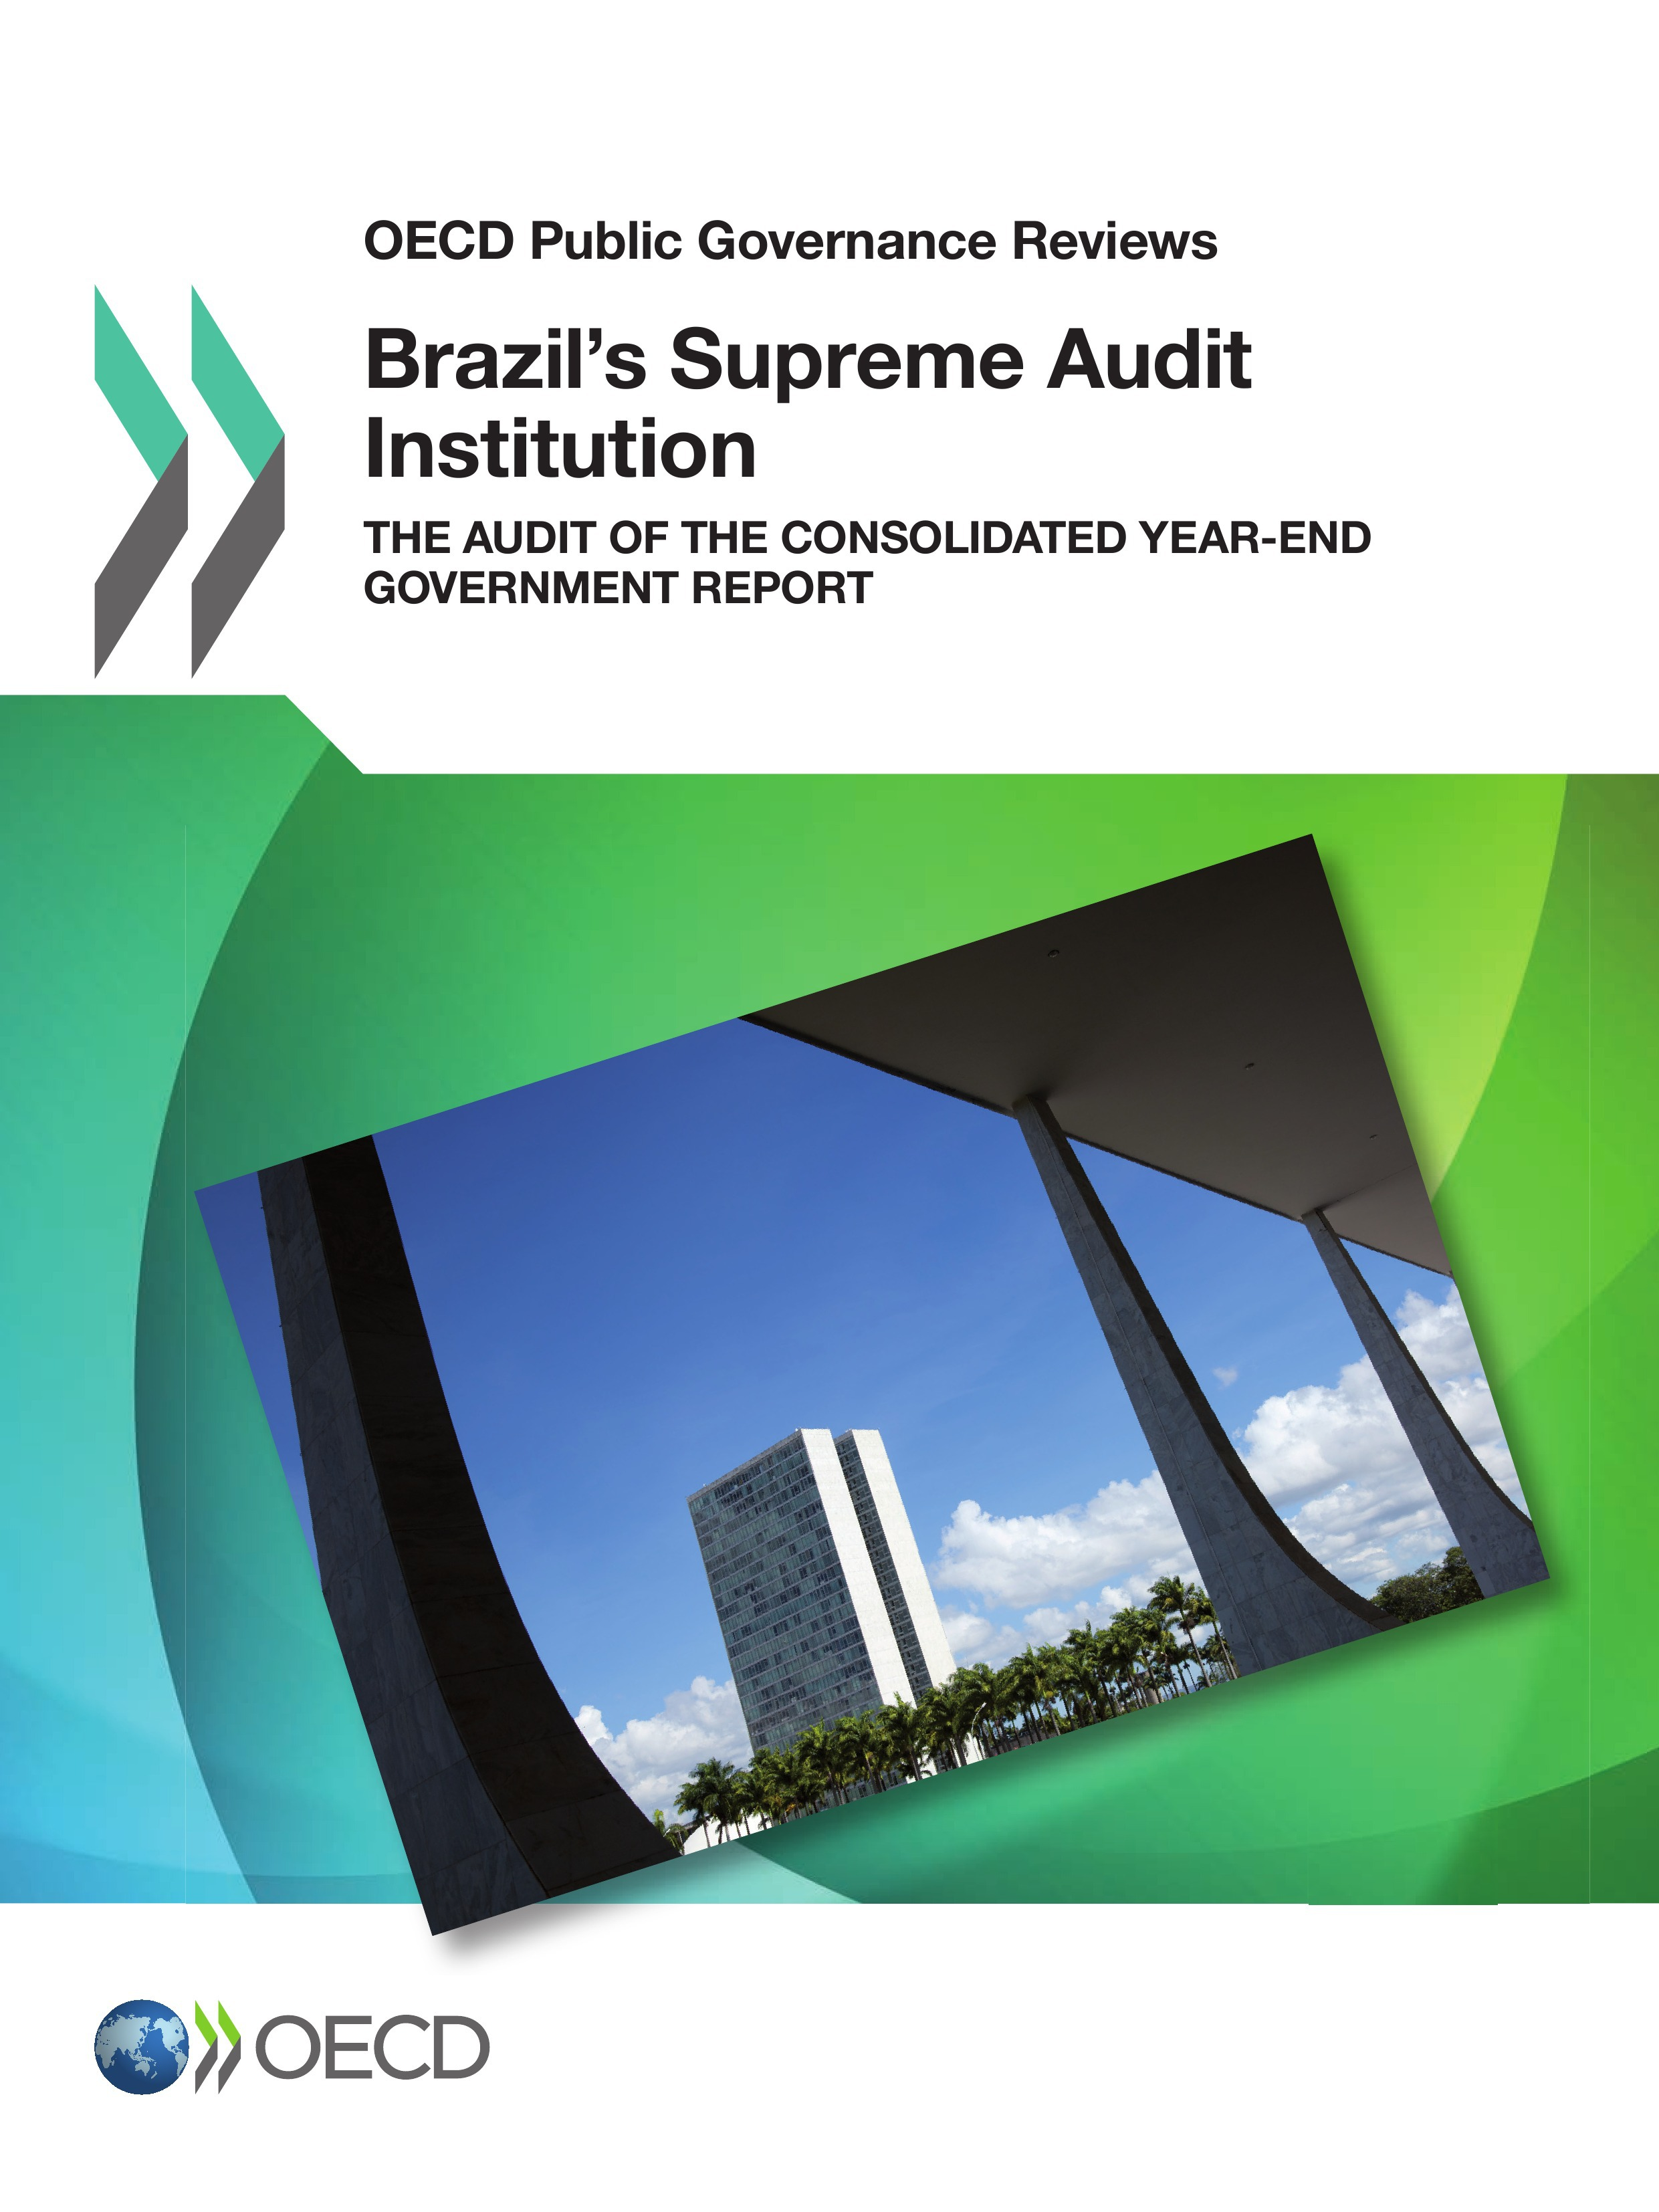 Brazil's Supreme Audit Institution